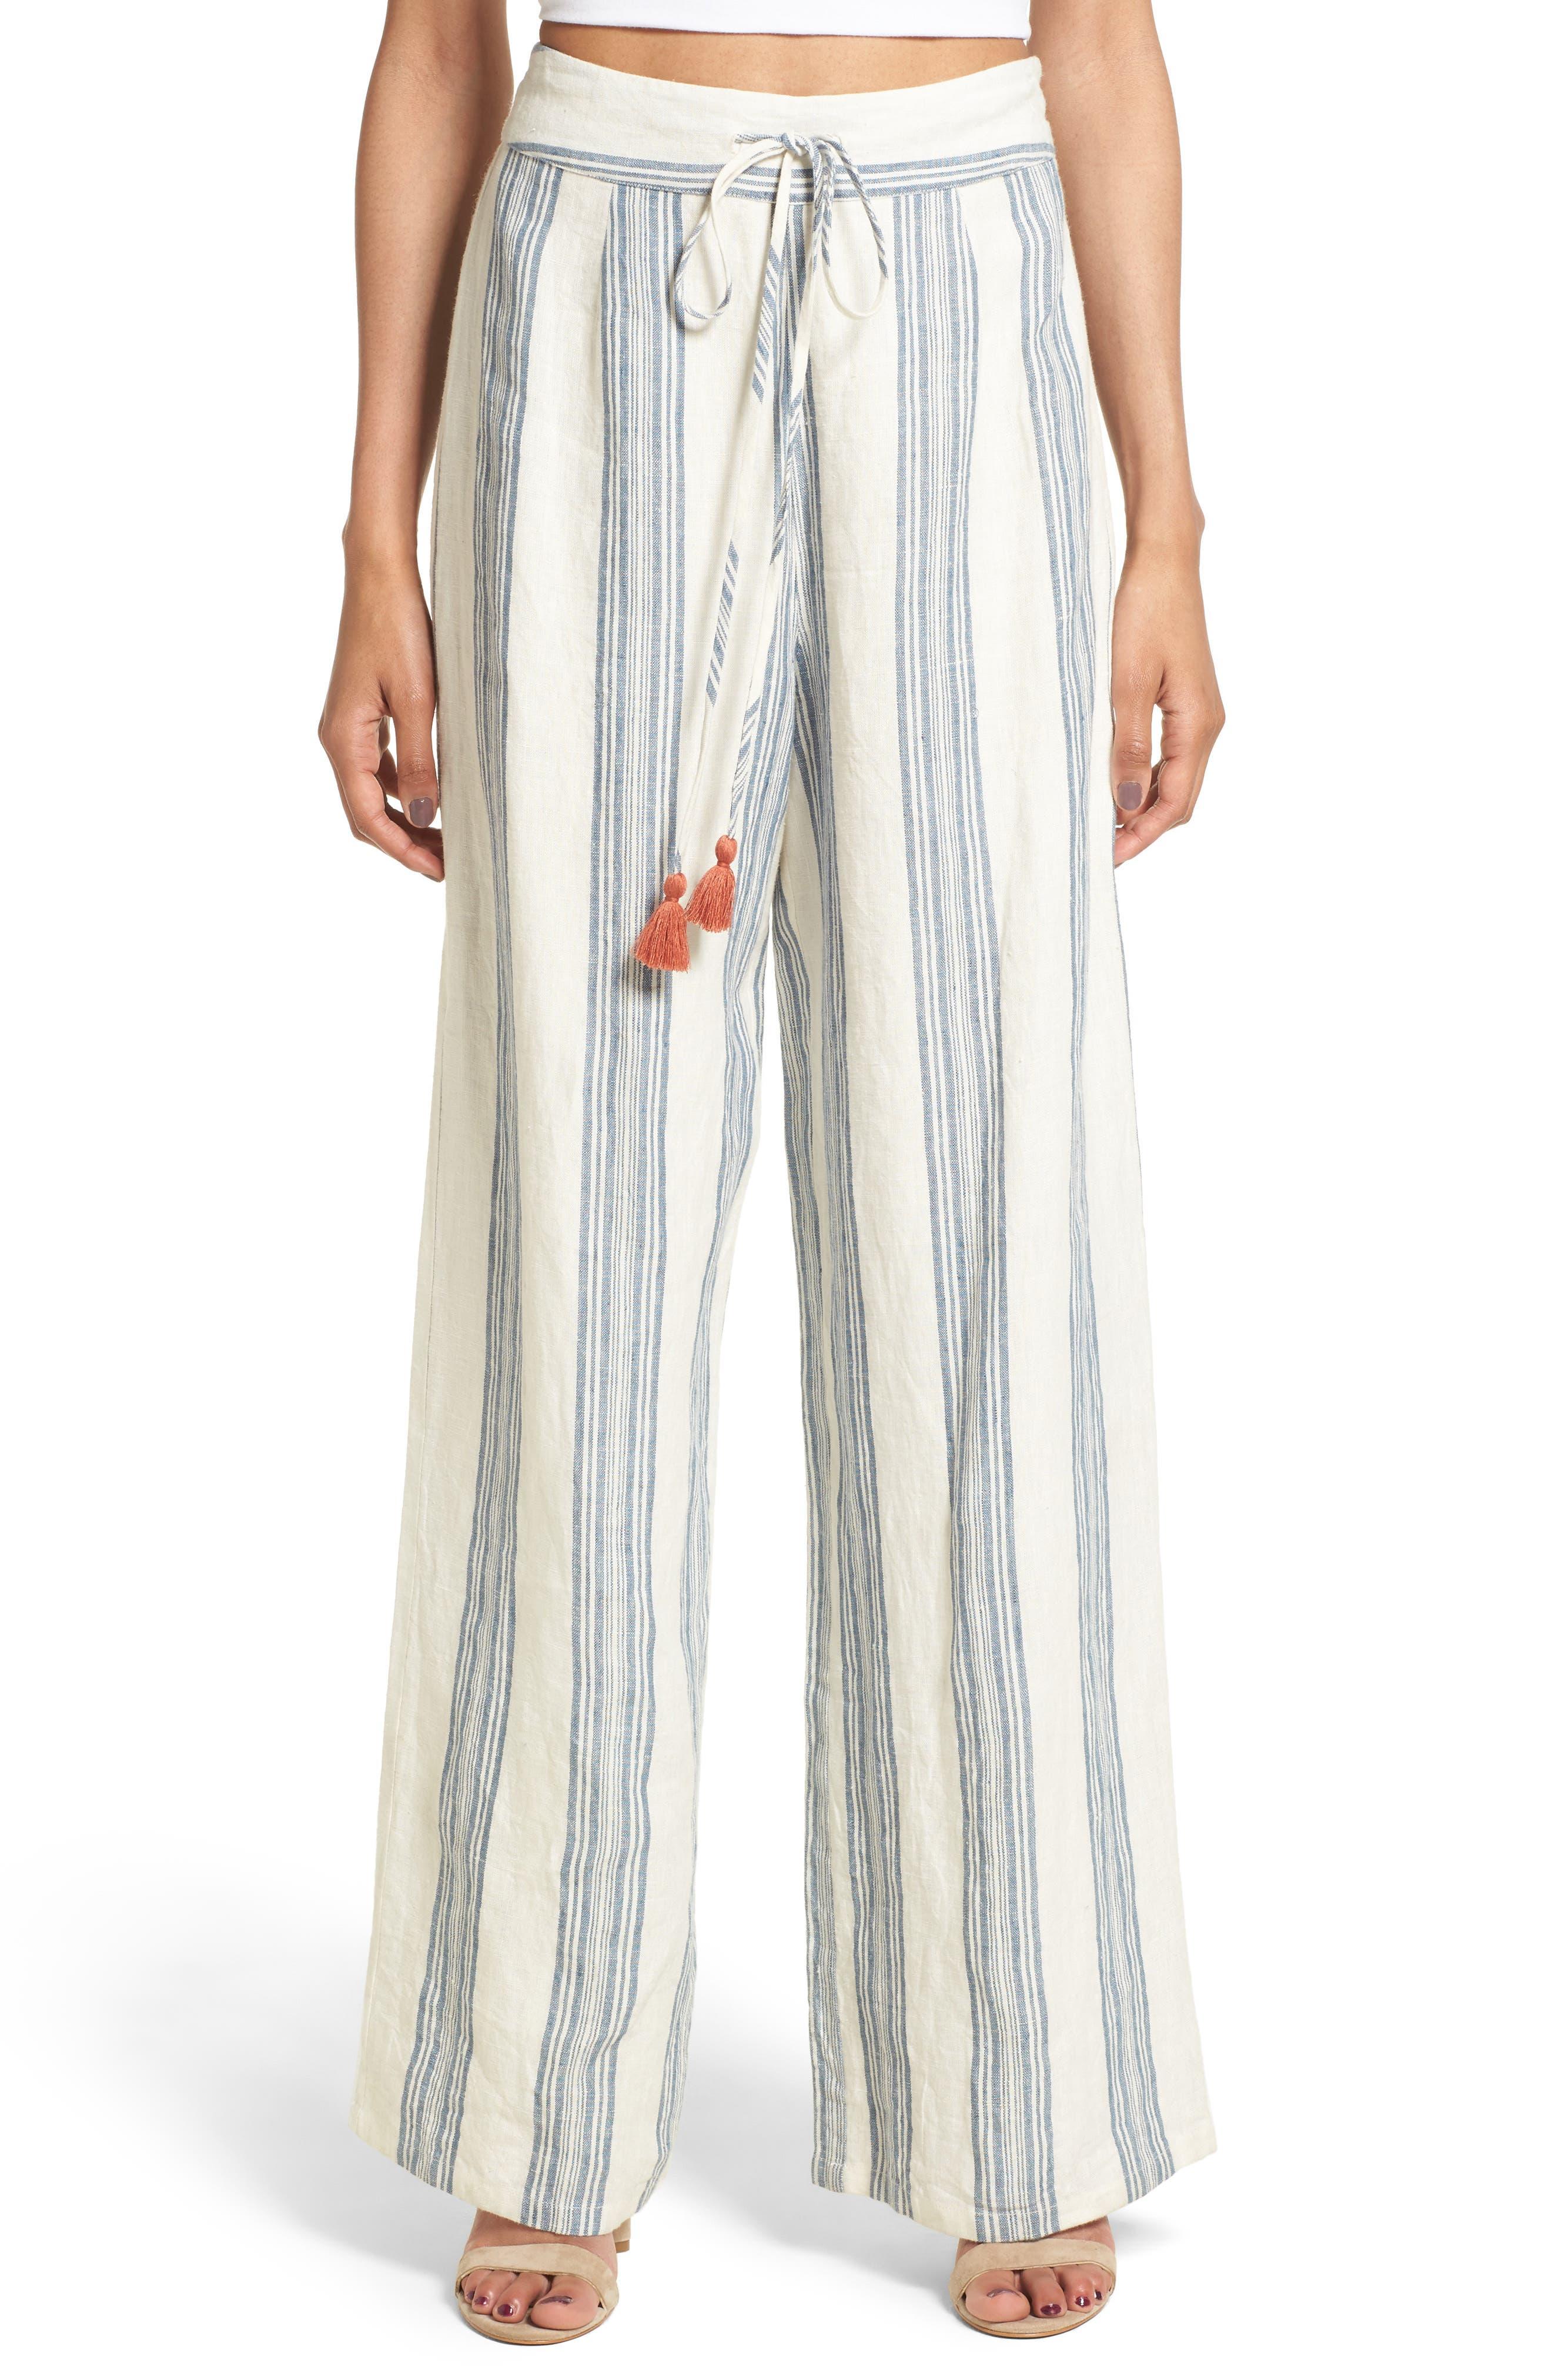 Tularosa Marley Linen Pants